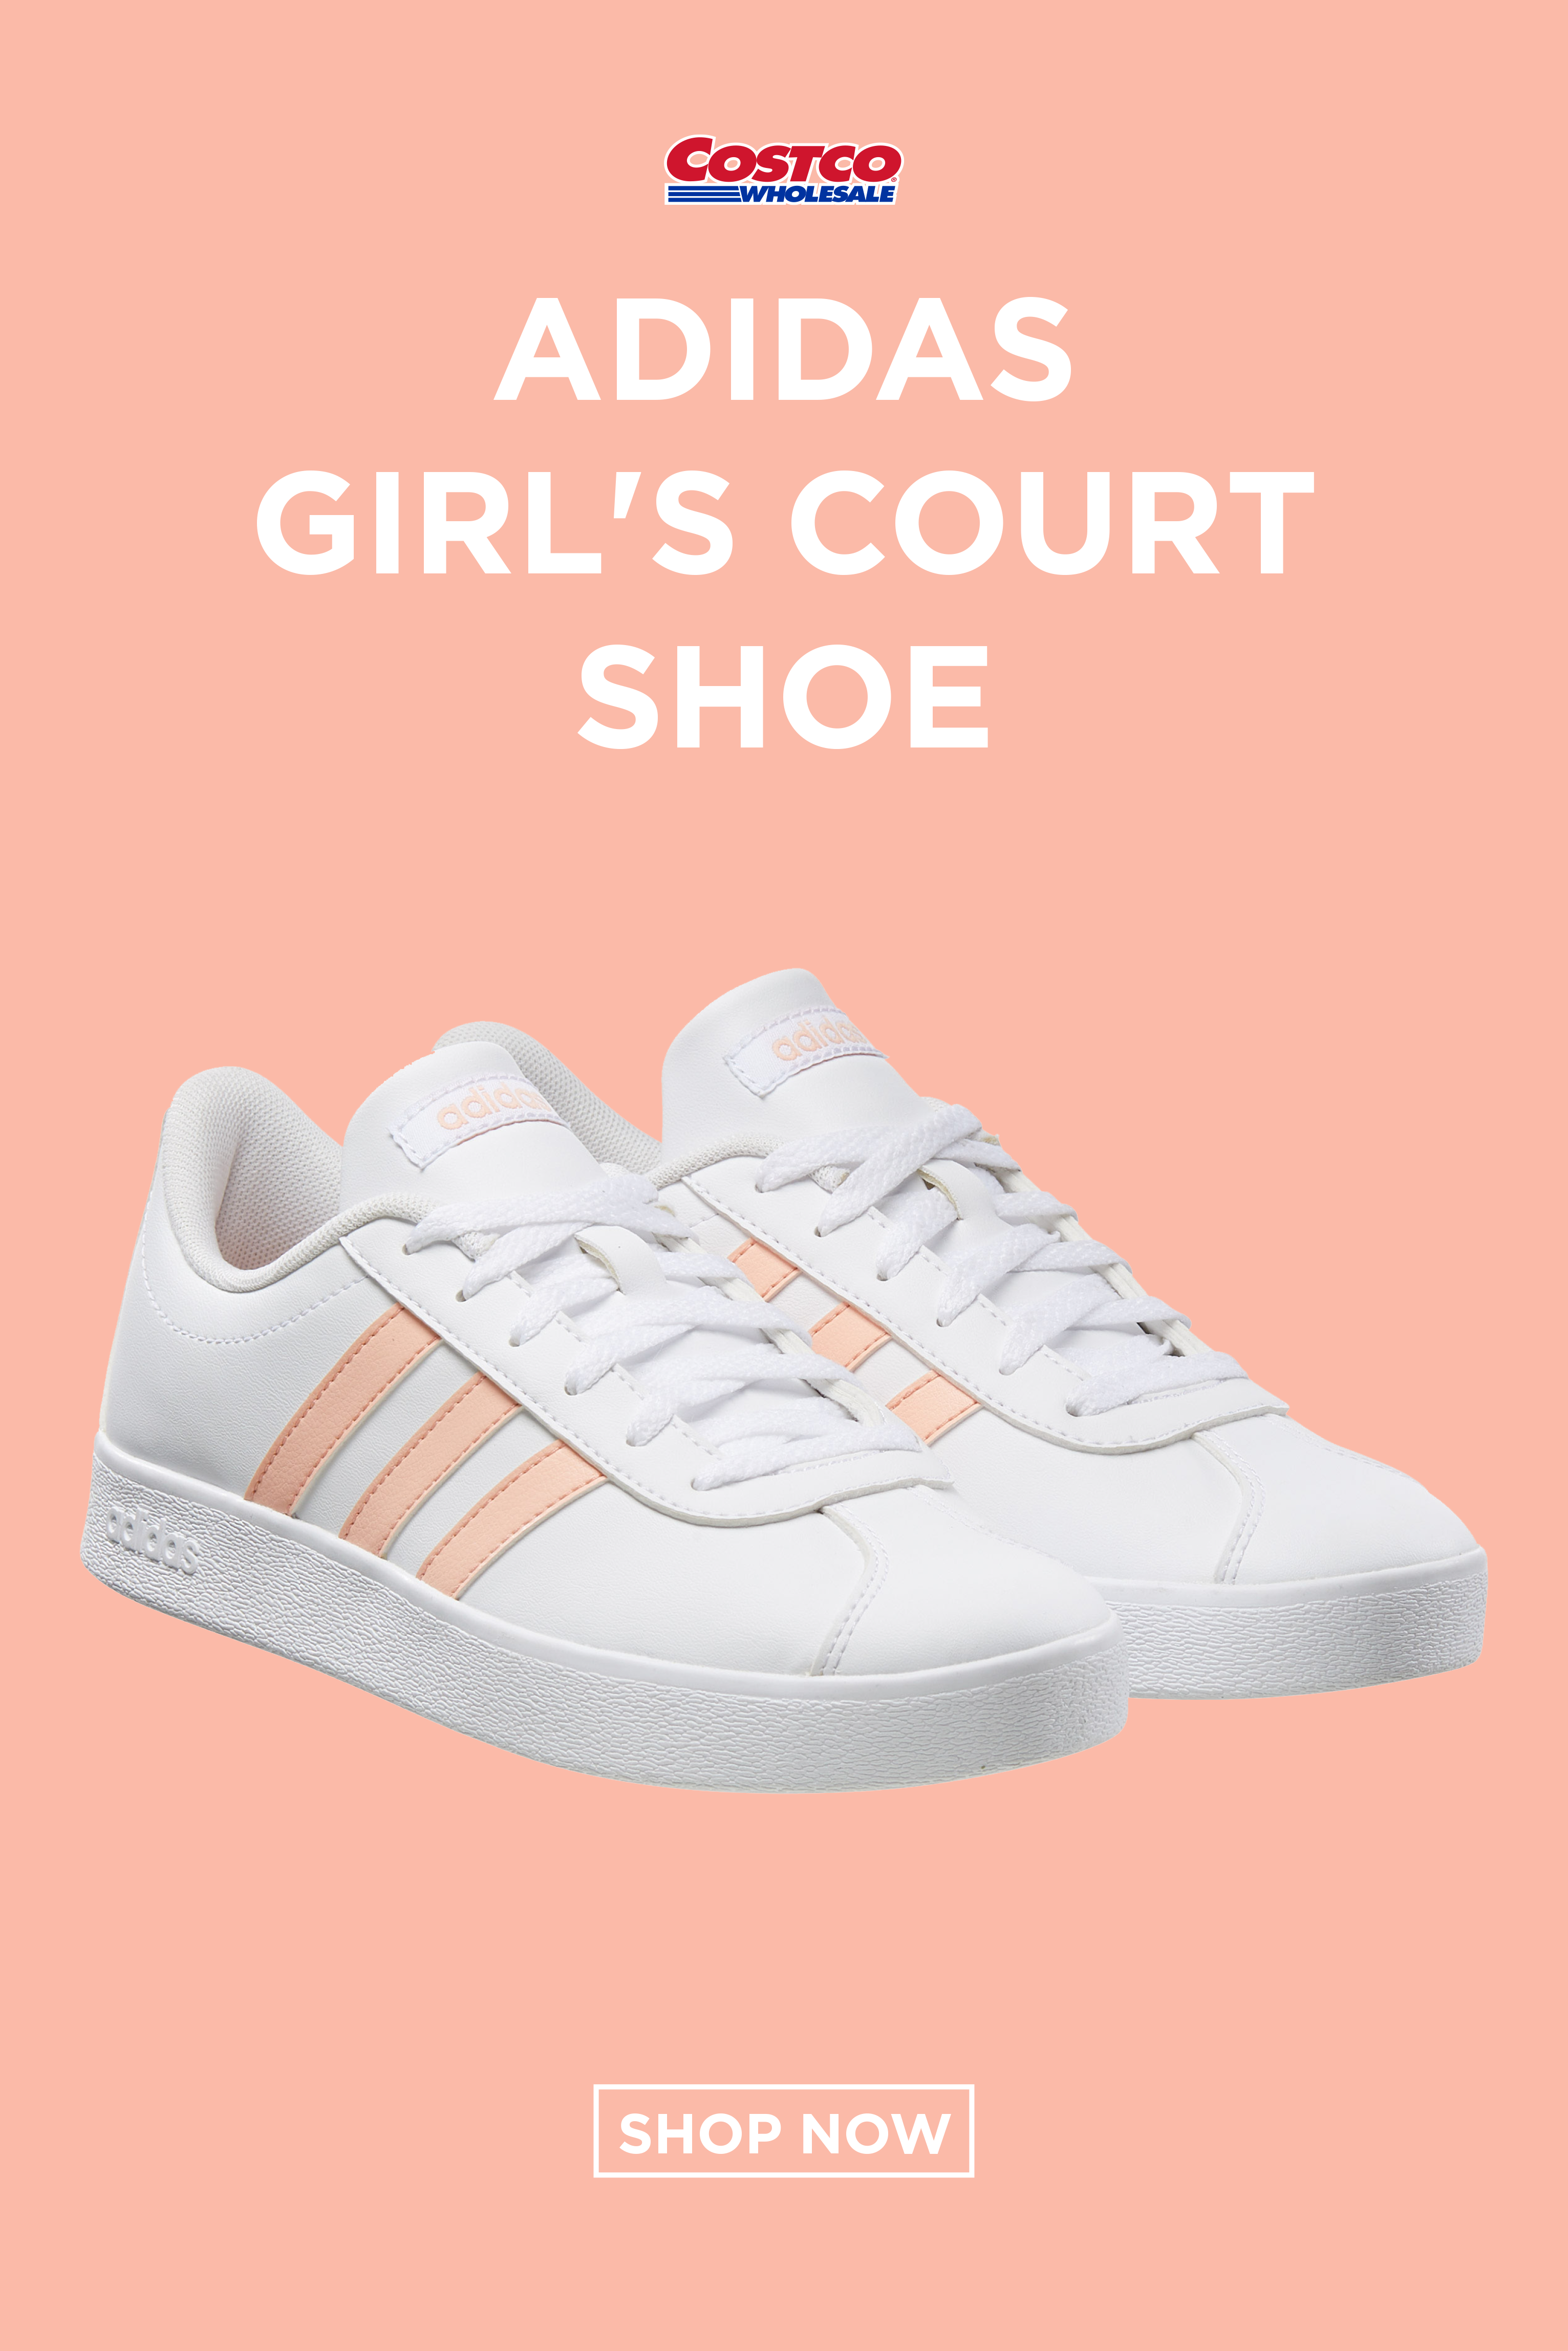 costco adidas womens shoes